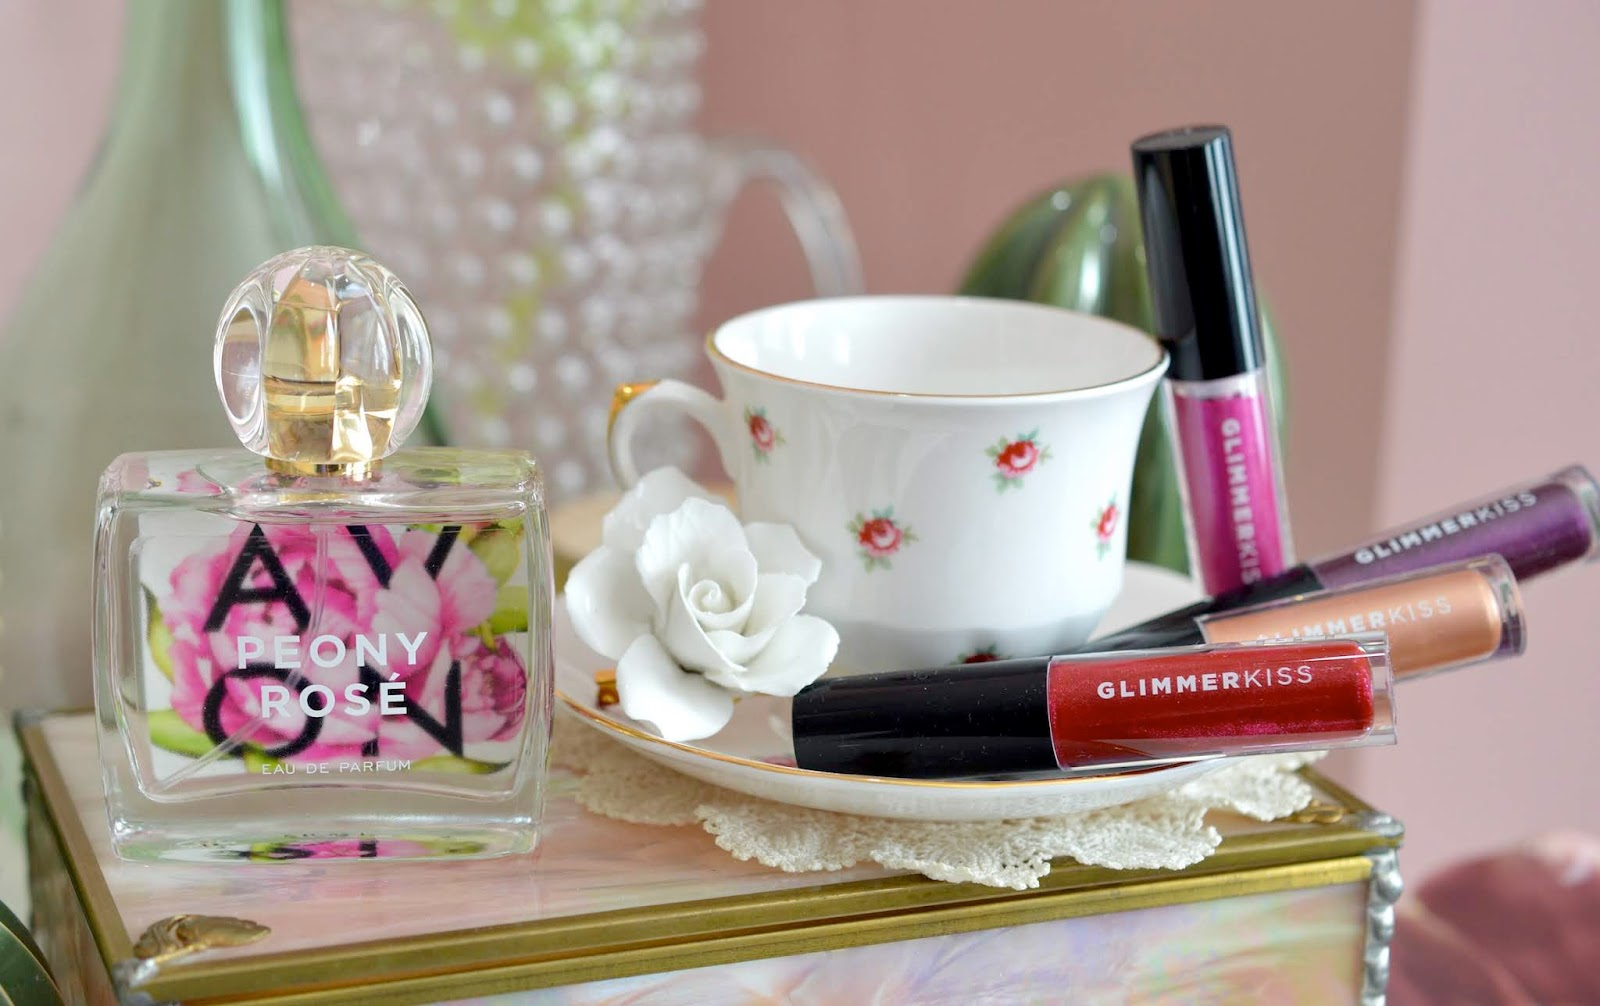 AVON Glimmerkiss Liquid Lipstick Peony Rosé